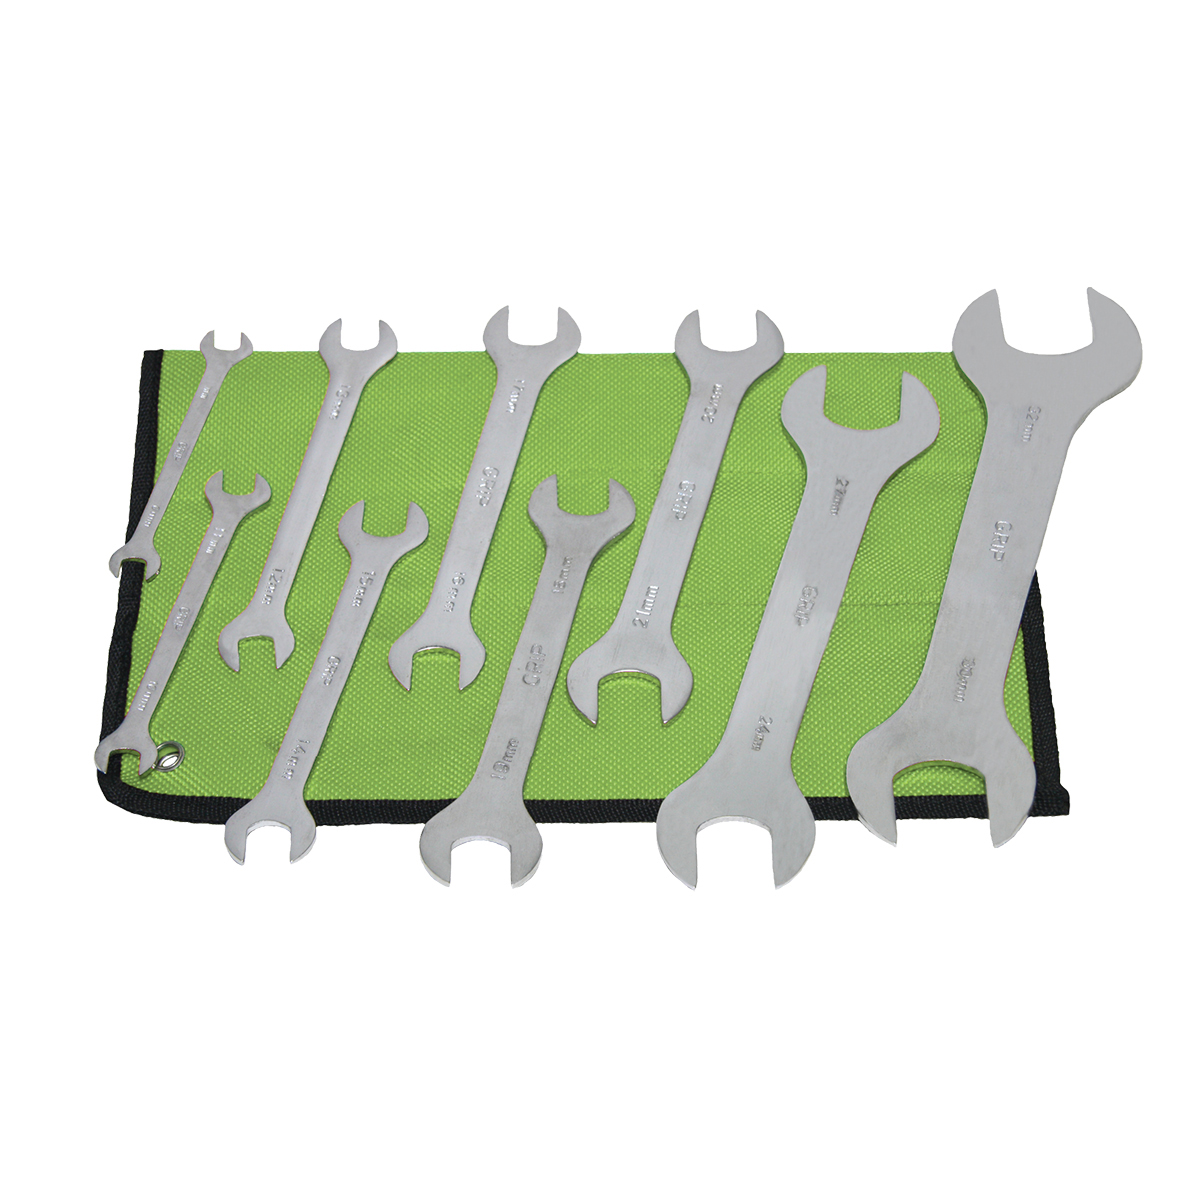 Grip 7 pc Thin Wrench Set SAE